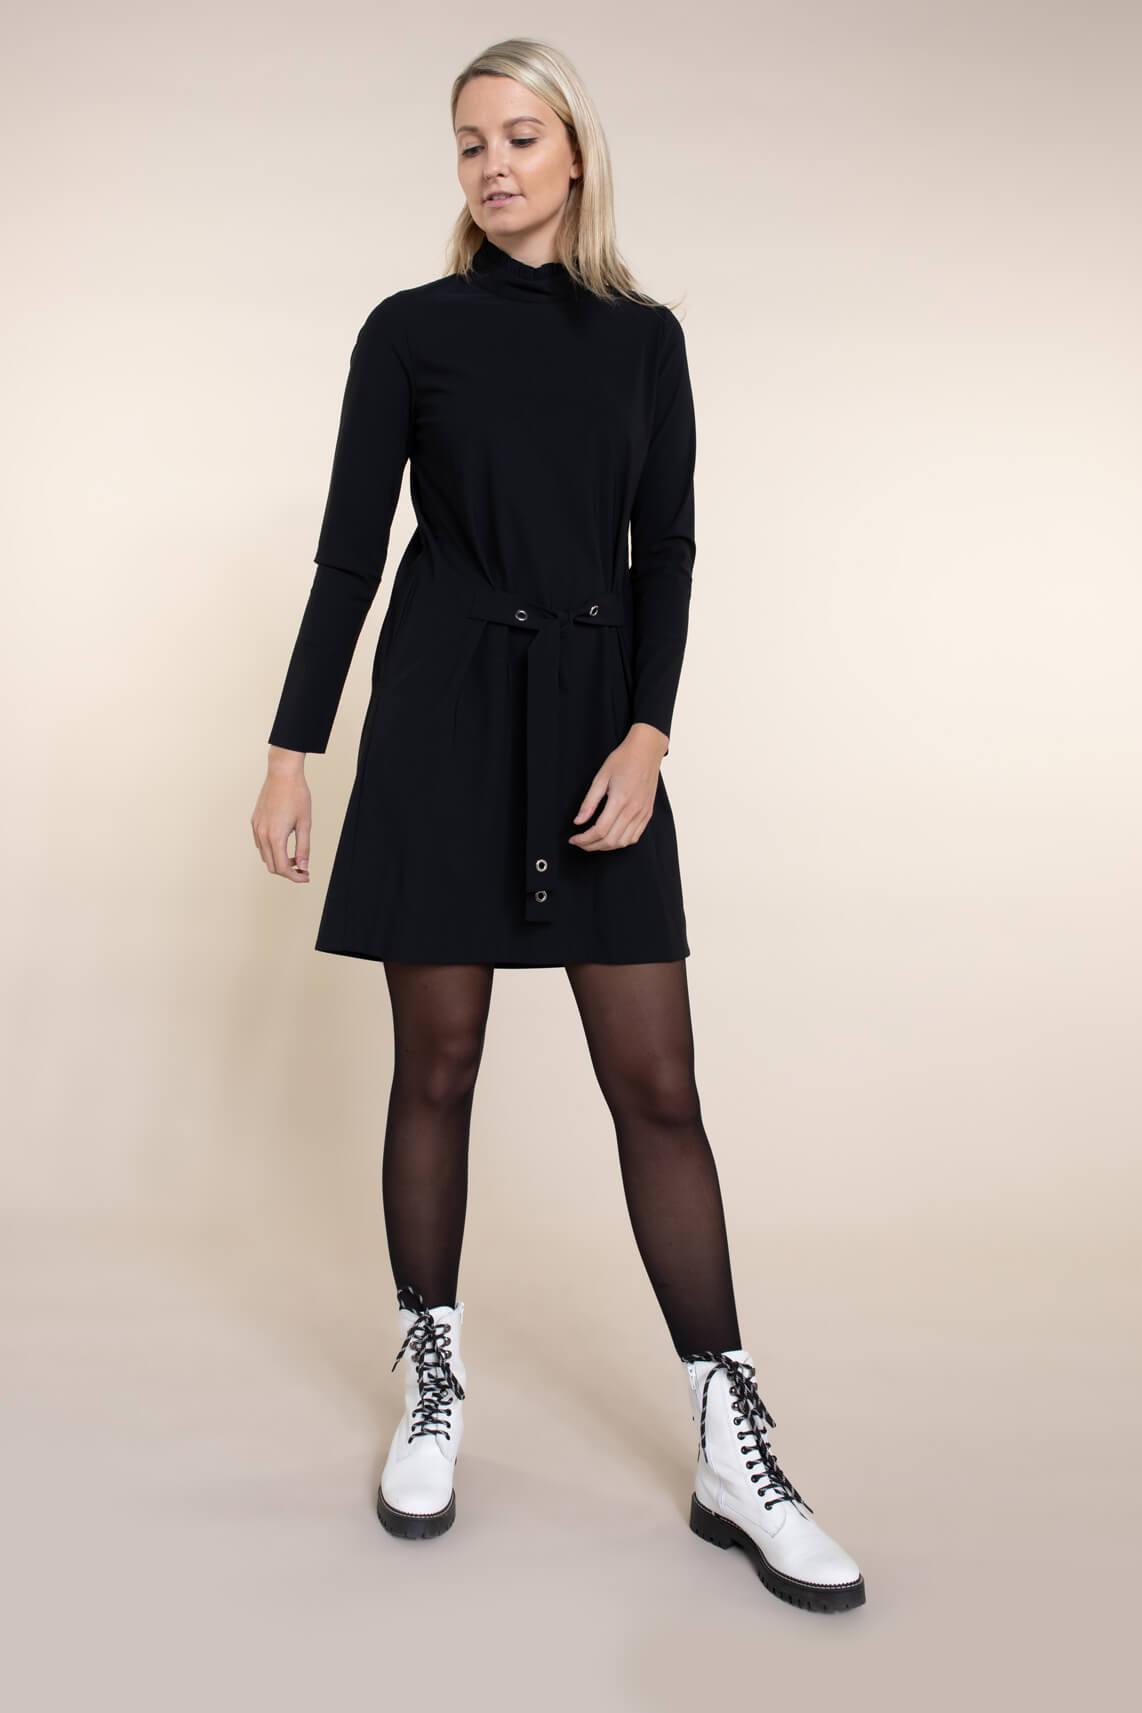 Jane Lushka Dames Zoe jurk zwart